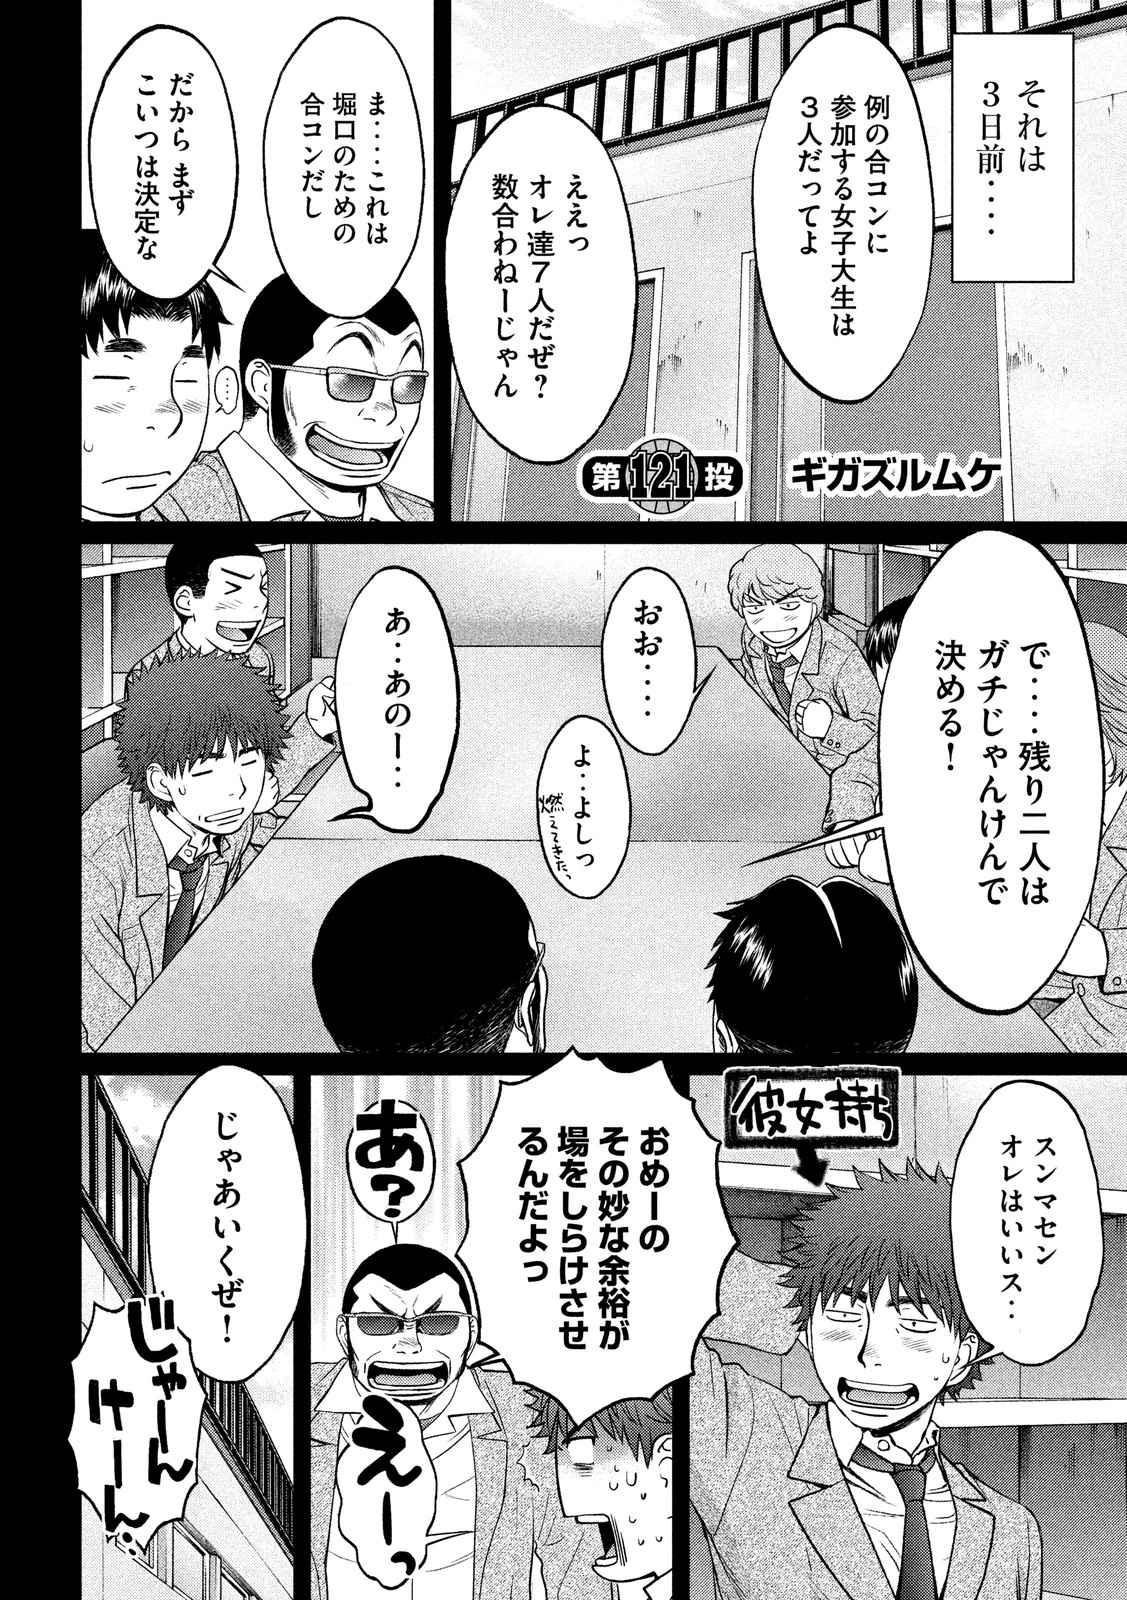 Hantsu x Trash - Chapter 121 - Page 2